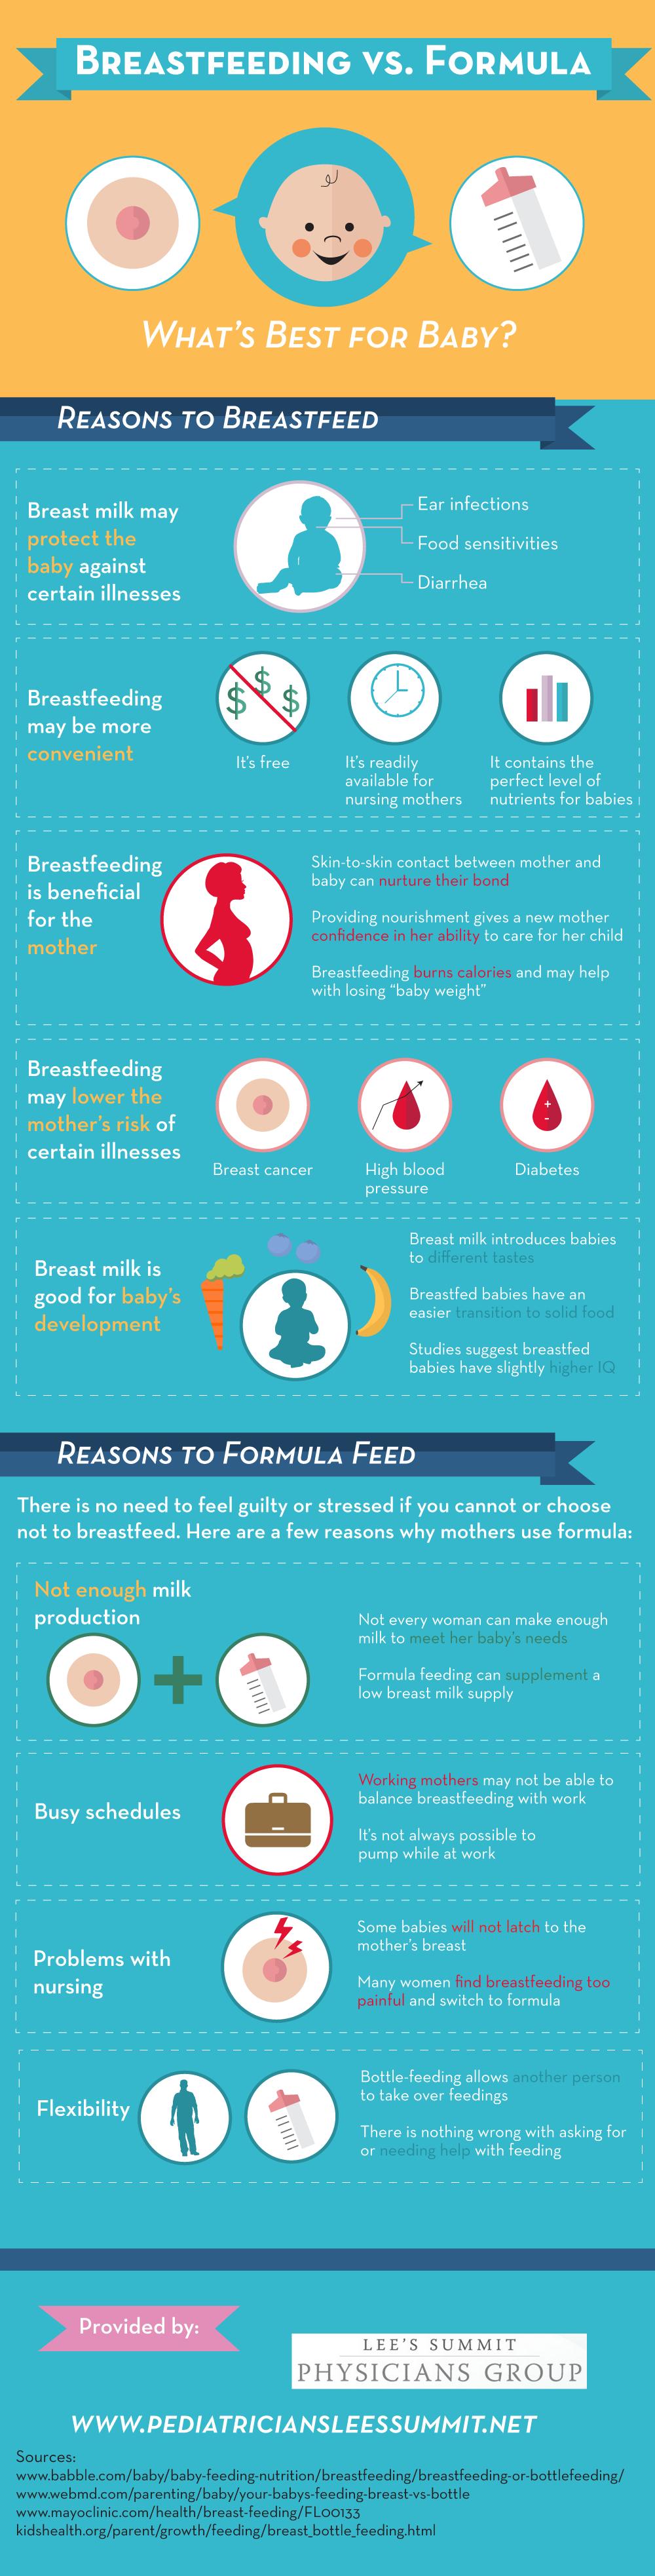 Breastfeeding vs Formula